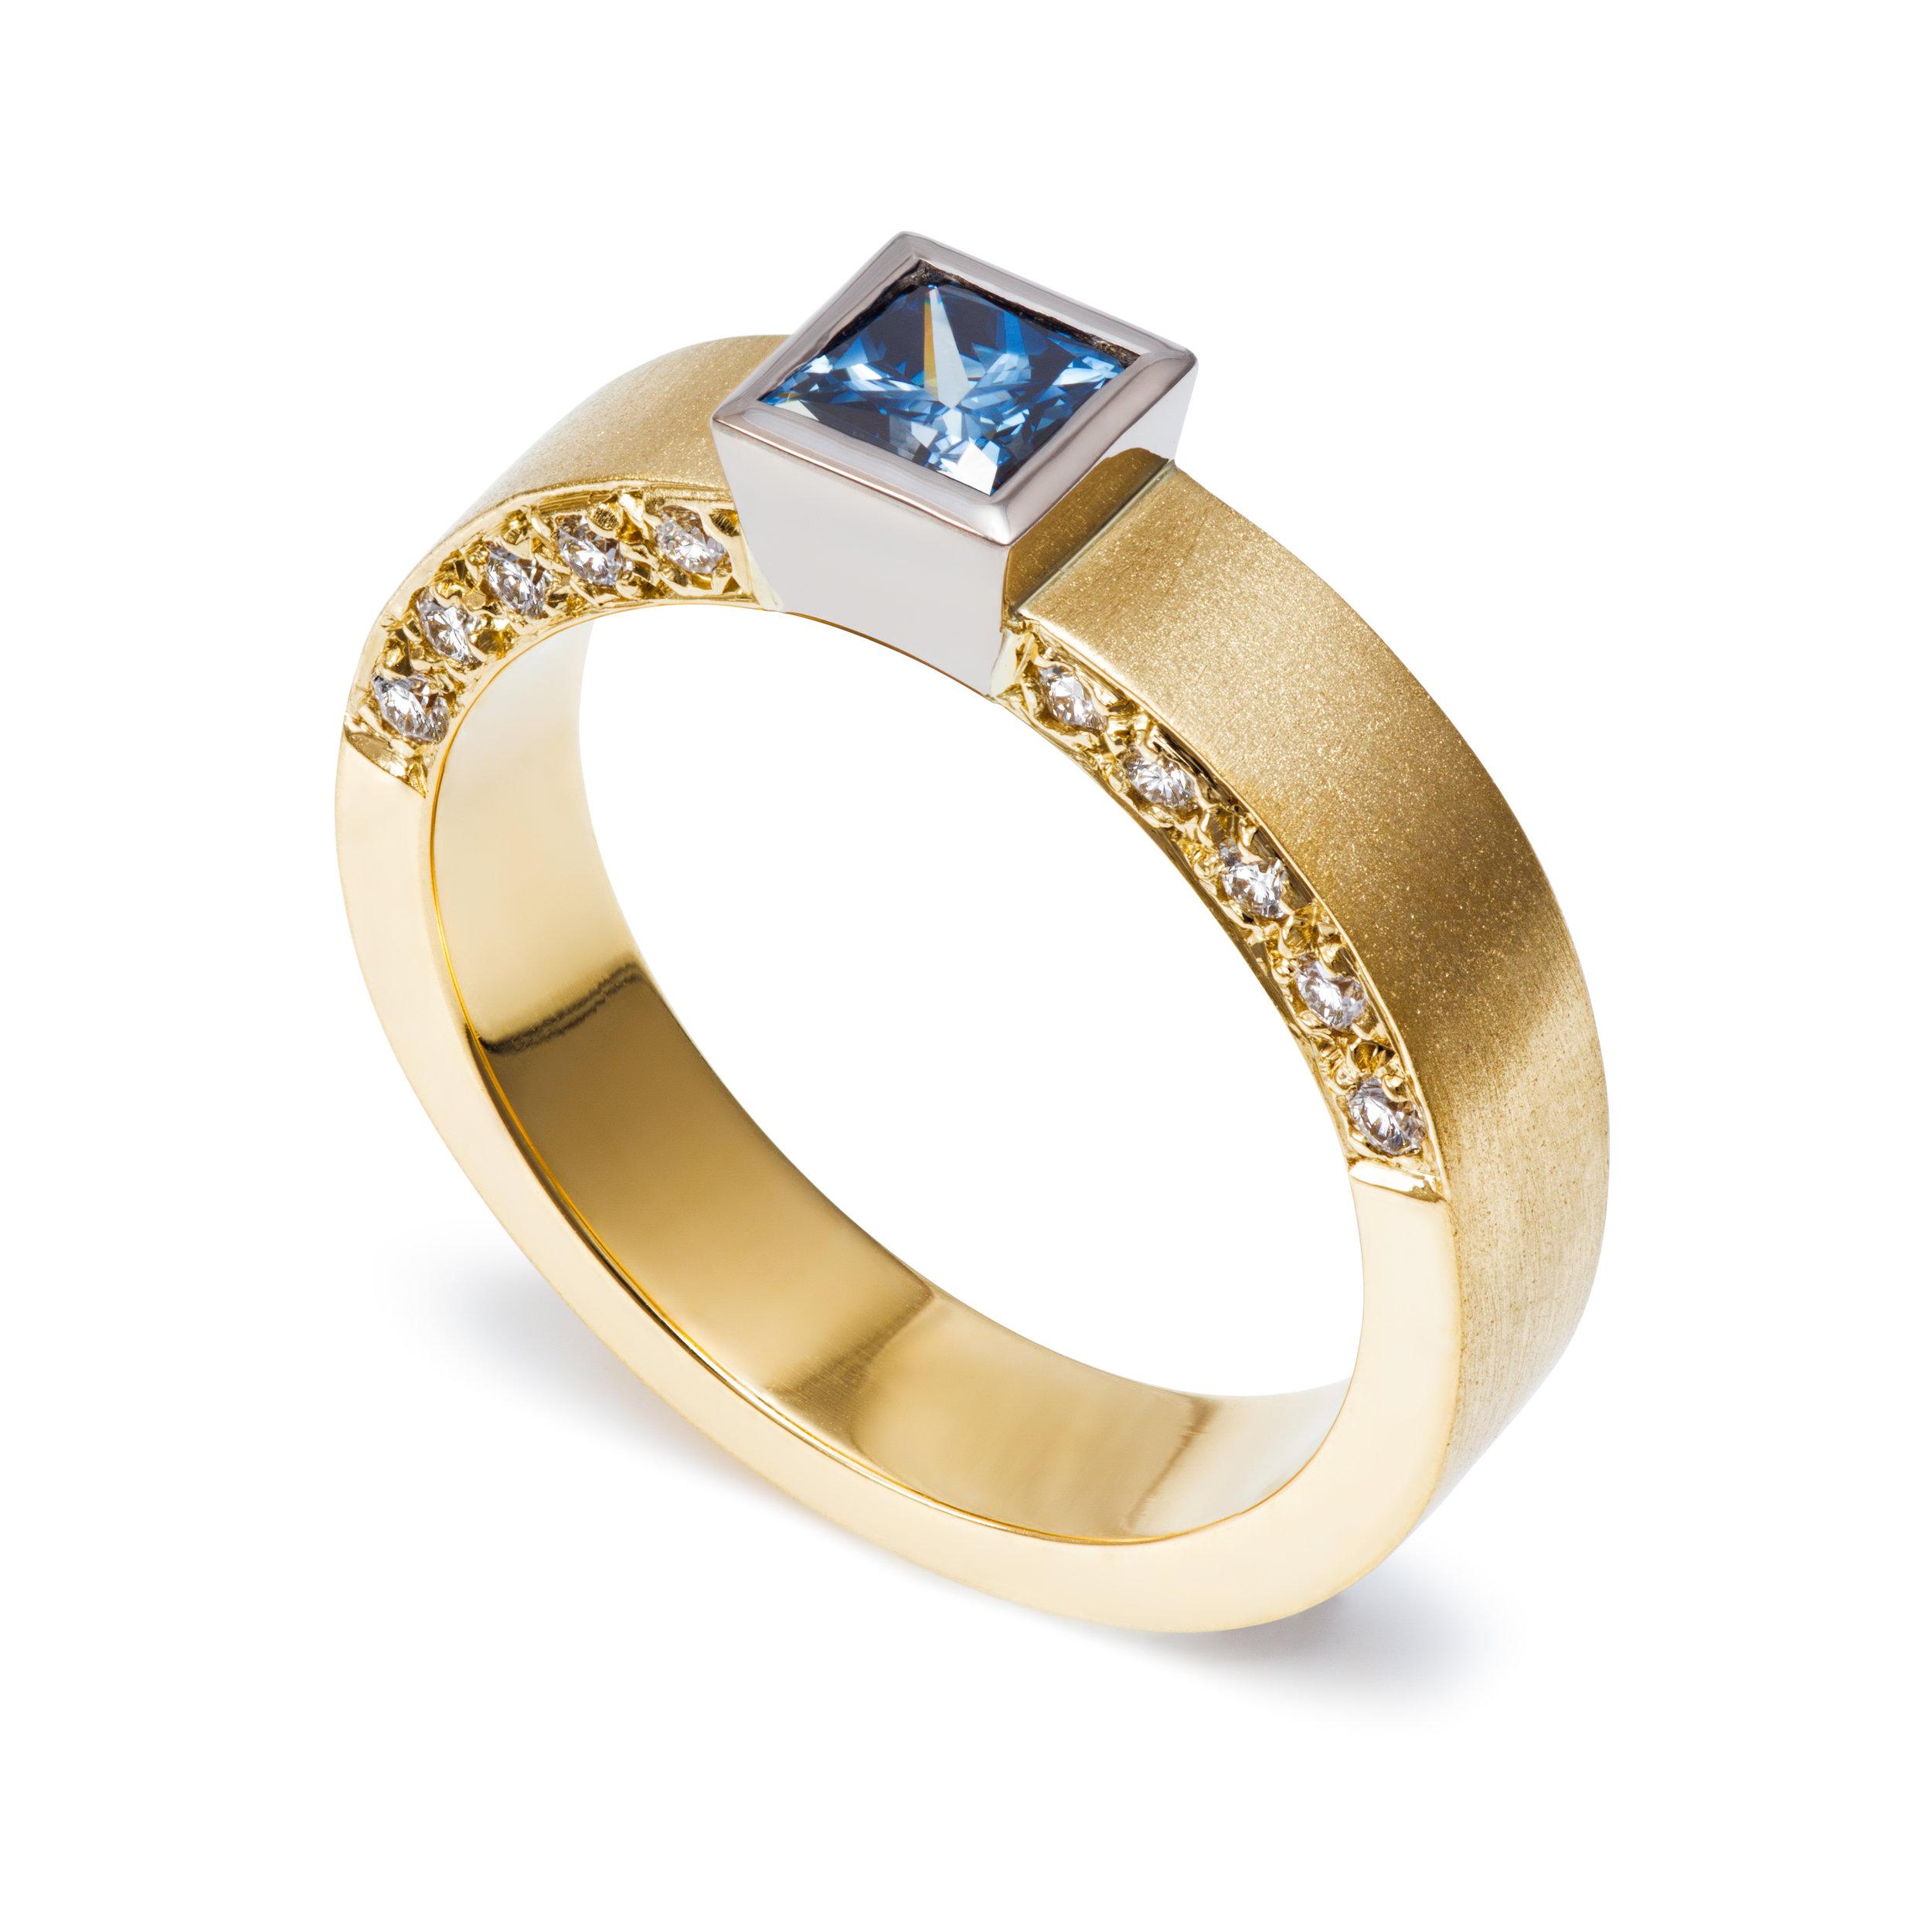 Bespoke 18ct yellow gold, blue diamond and round brilliant cut diamond ring commission